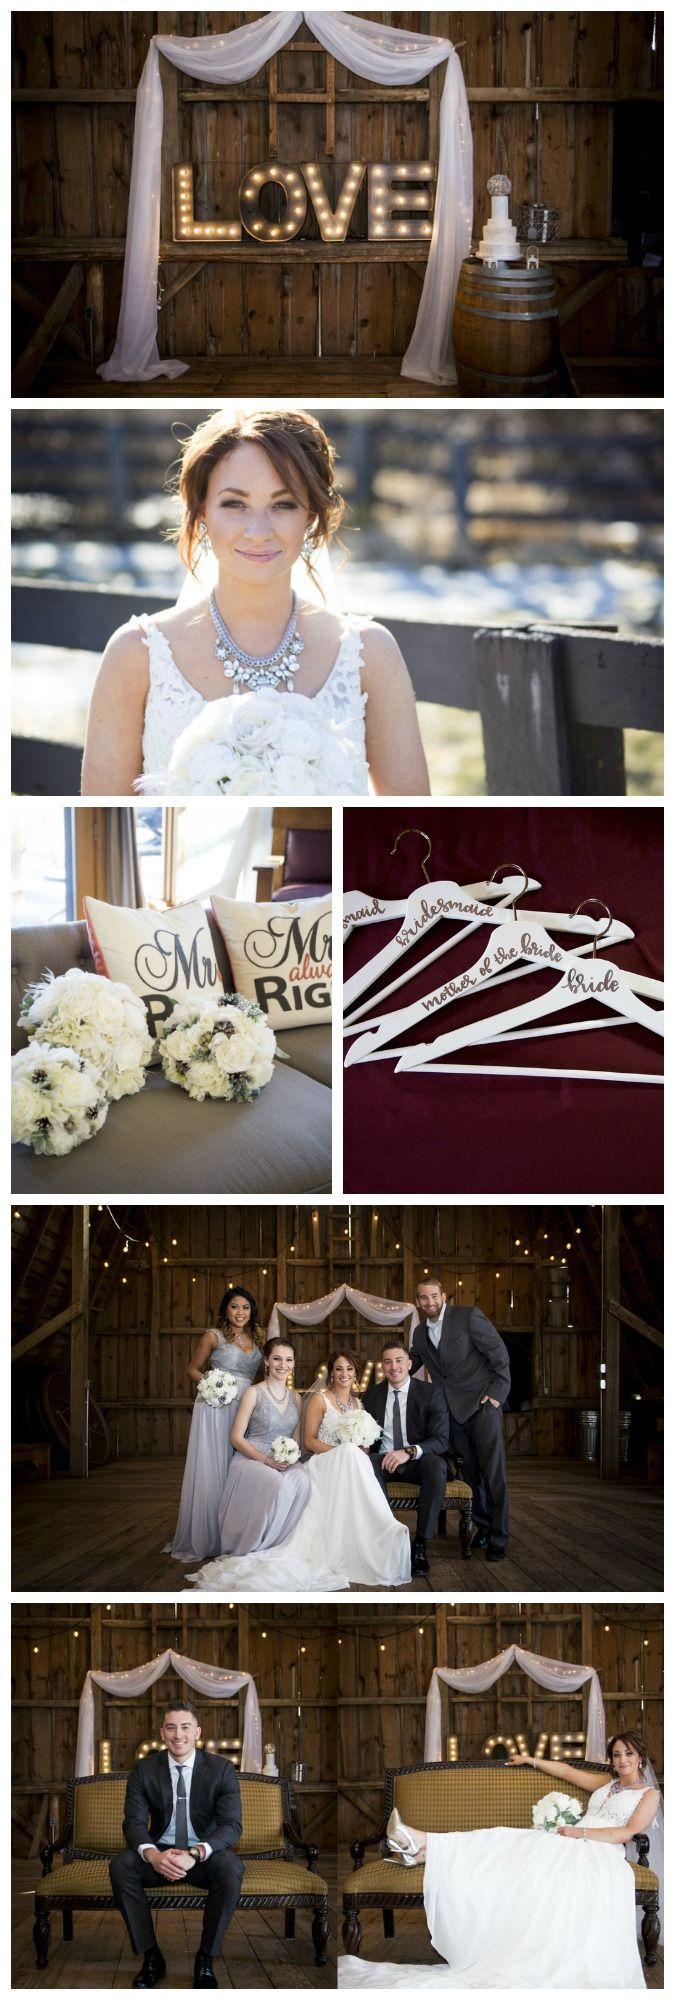 Glammed Up Barn Wedding